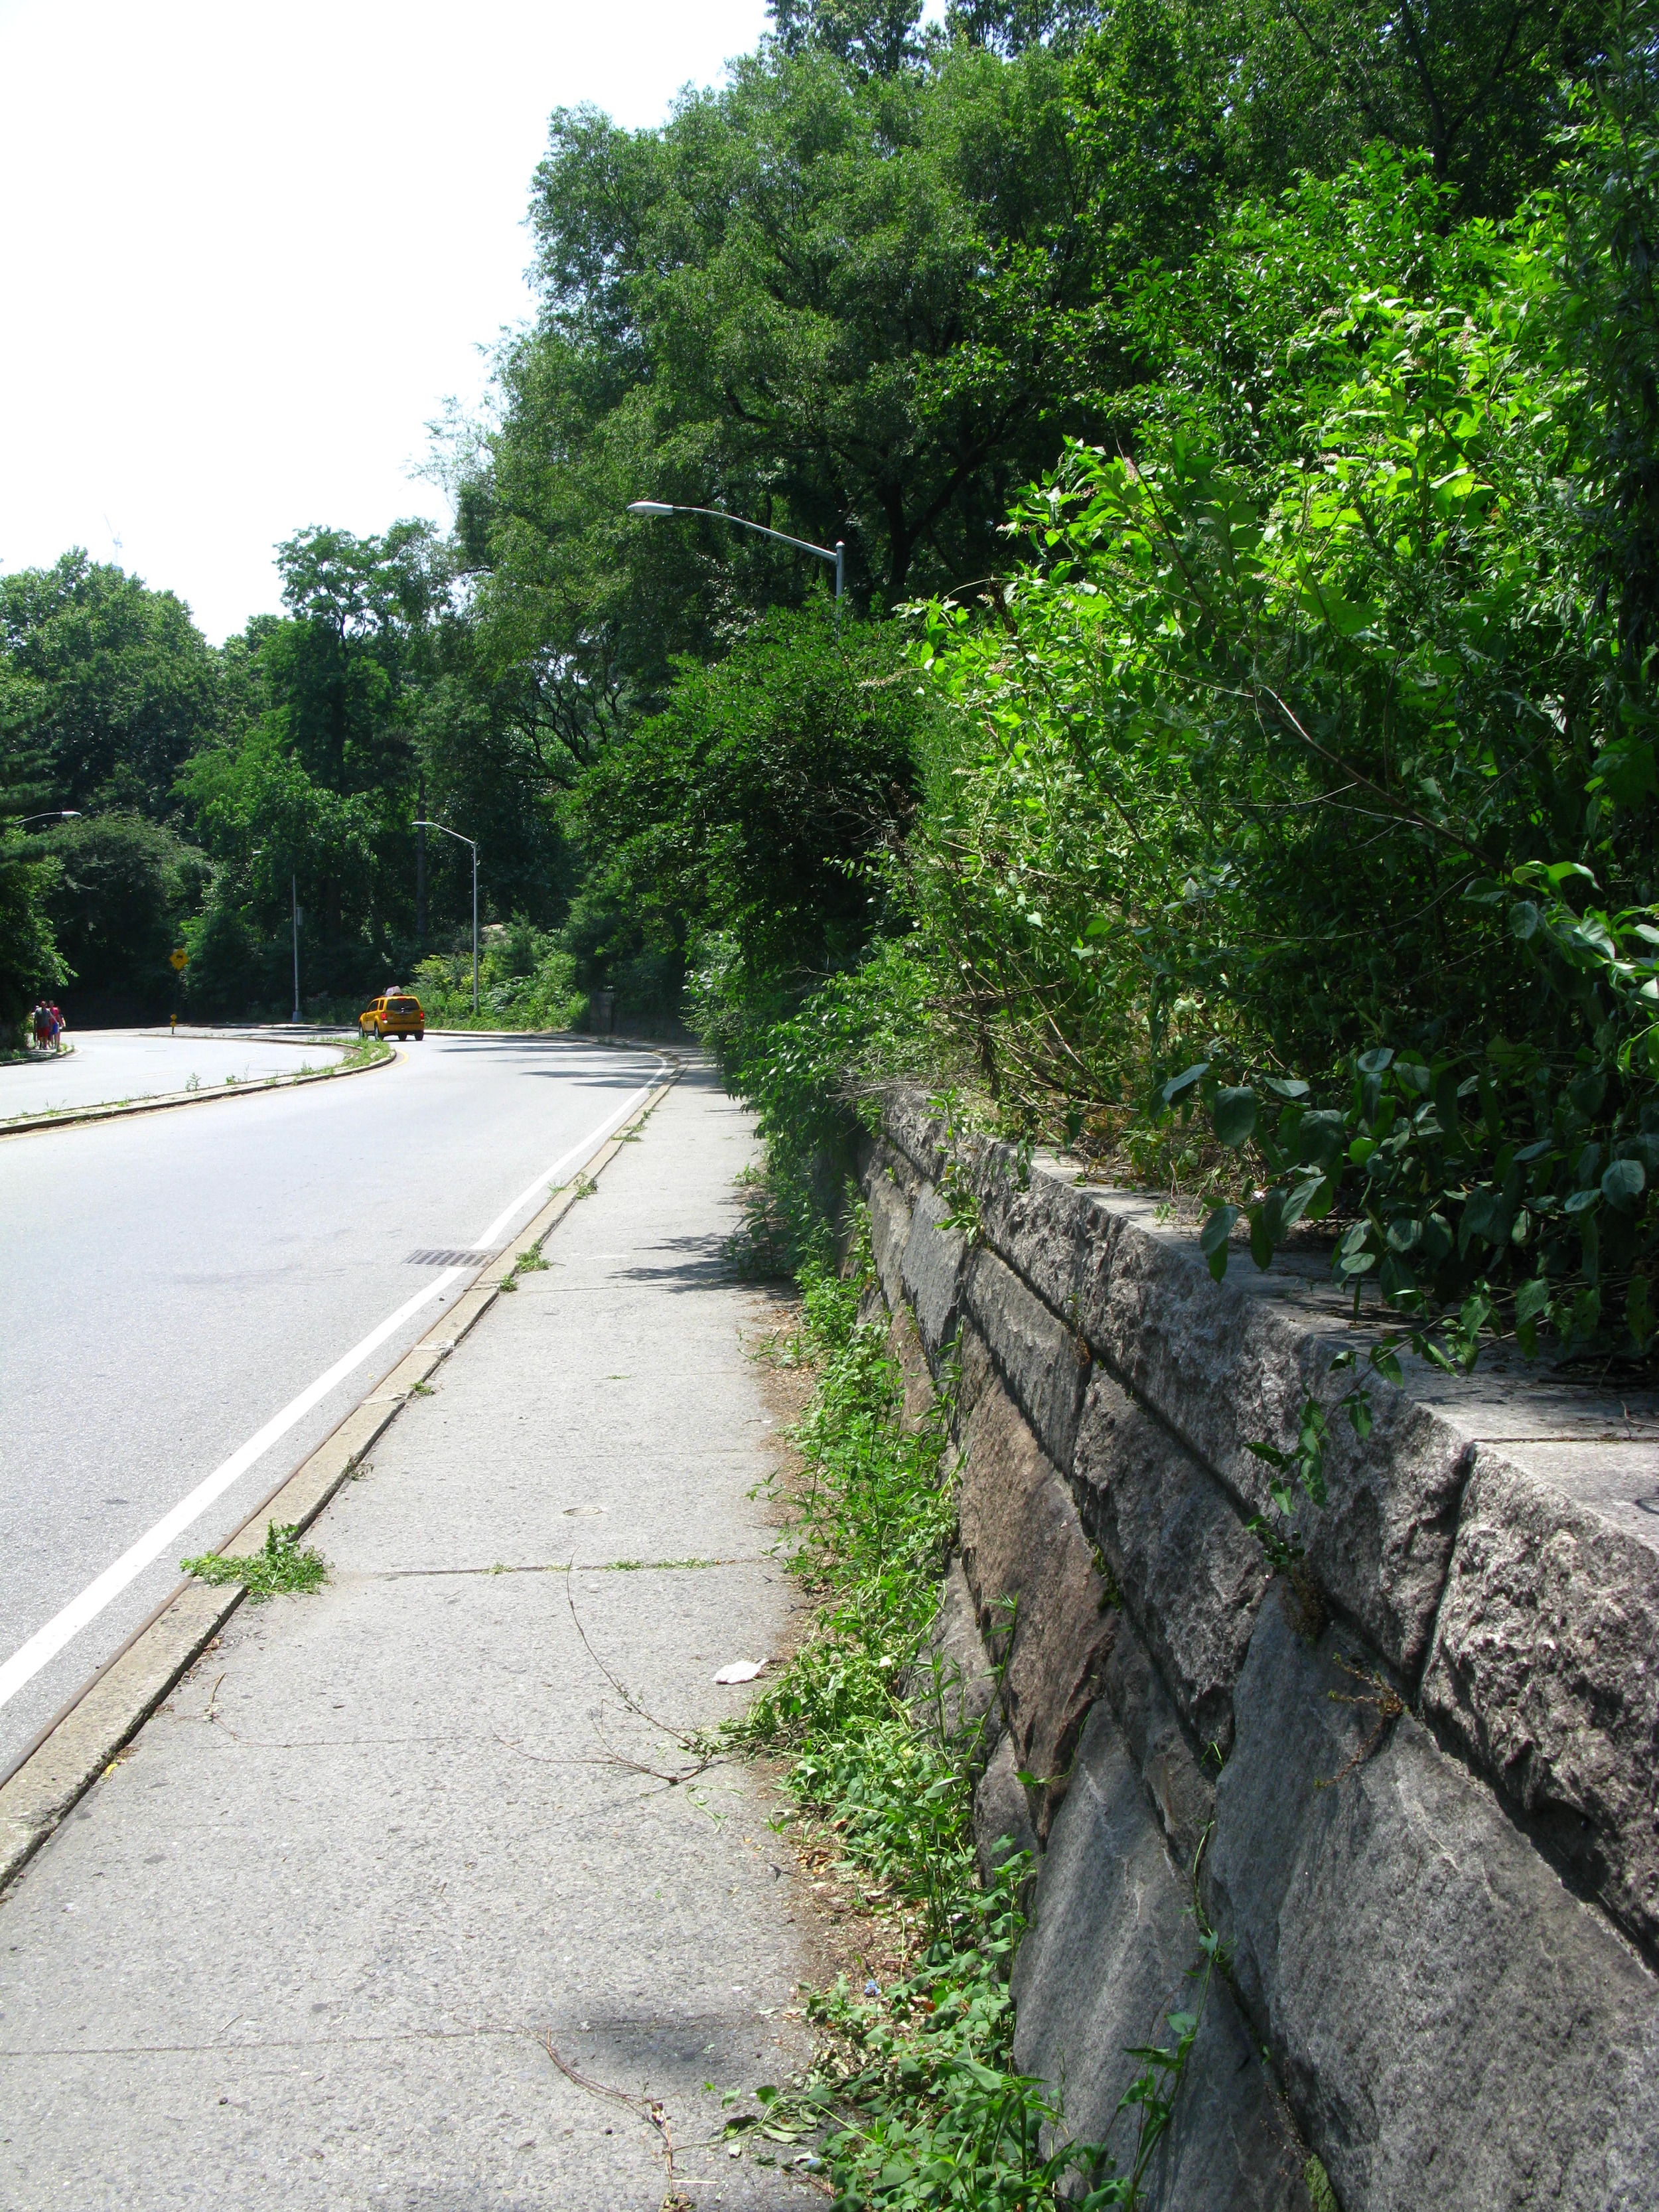 79 Street Transverse Road